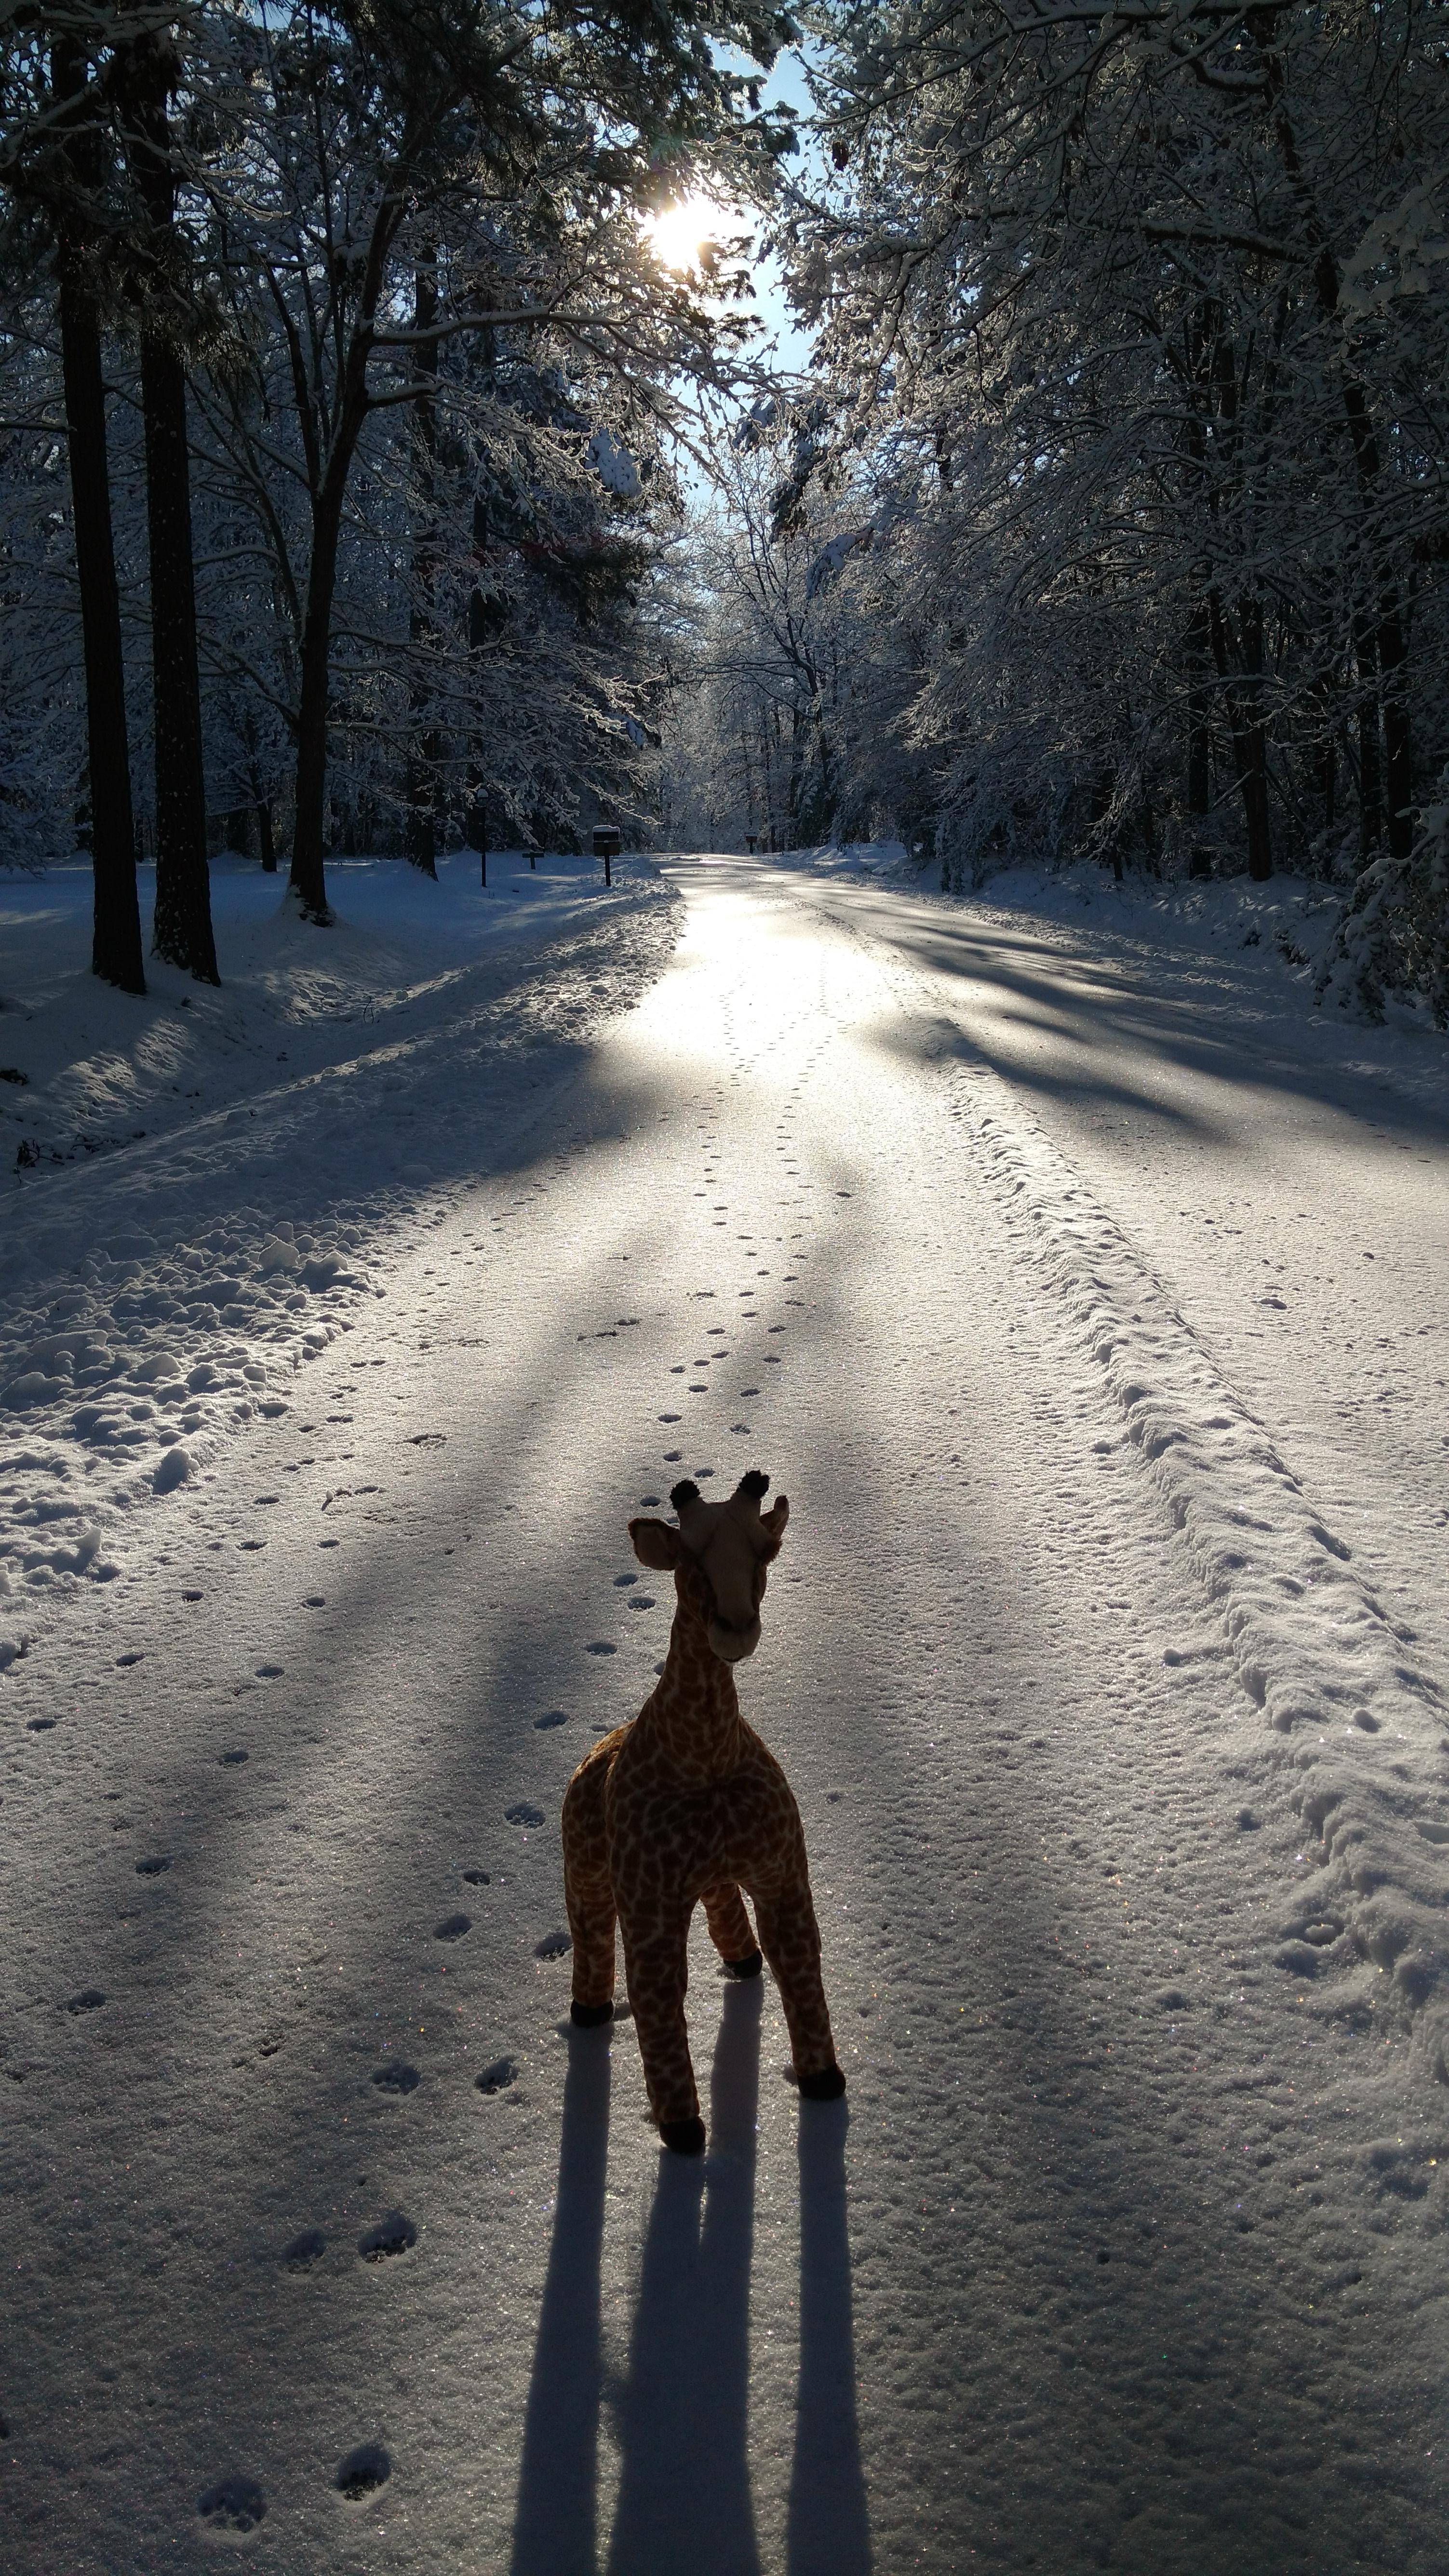 giraffe-pic